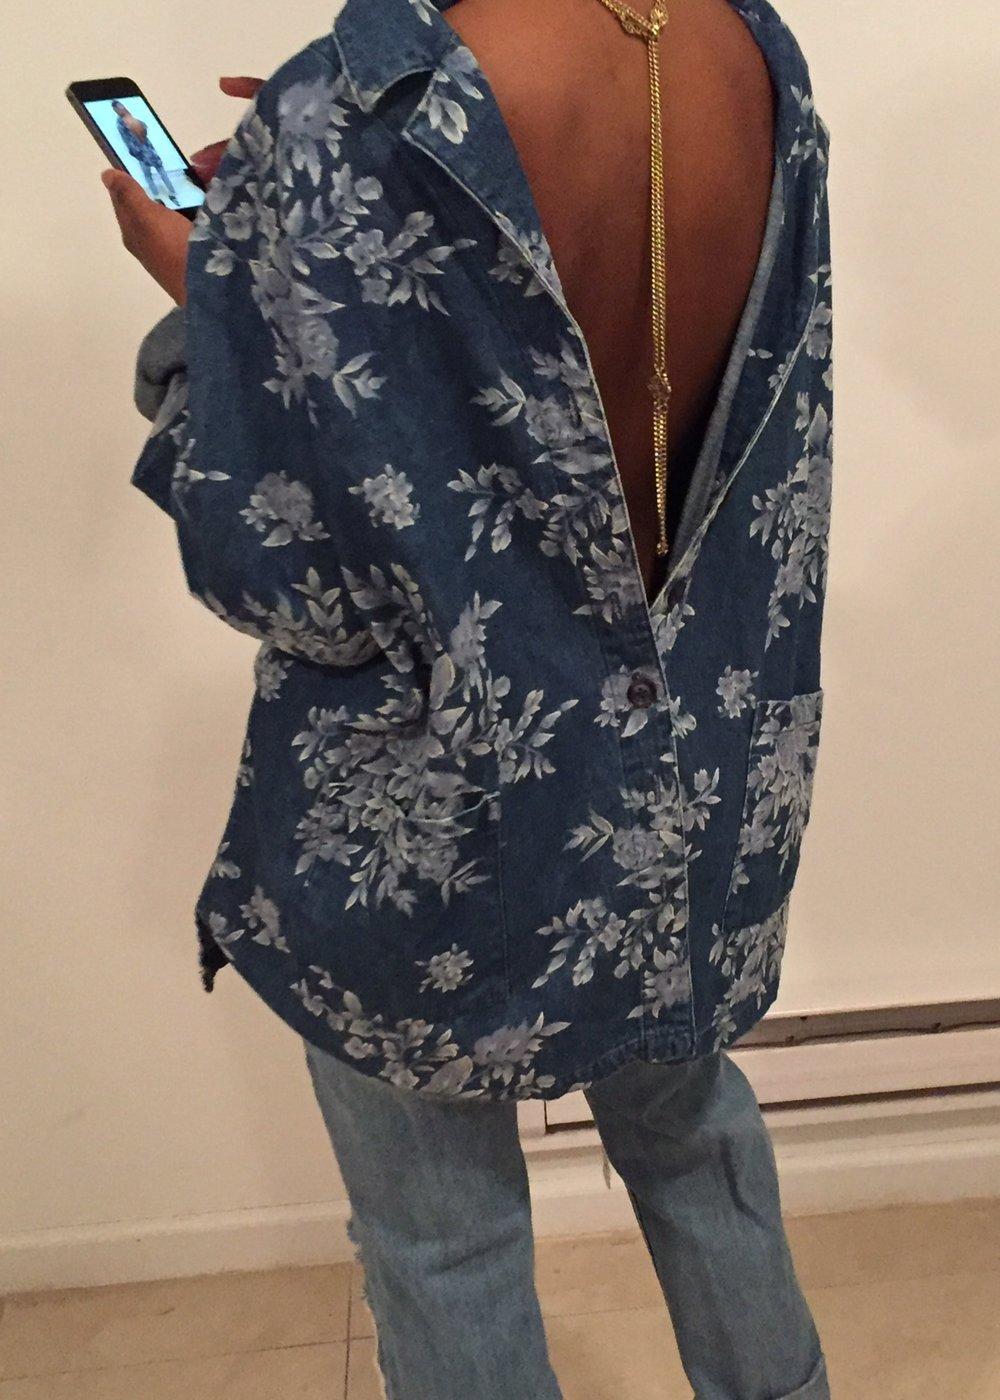 Denim on Denim - All items thrifted floral printed denim jacket(worn backwards), gold chain